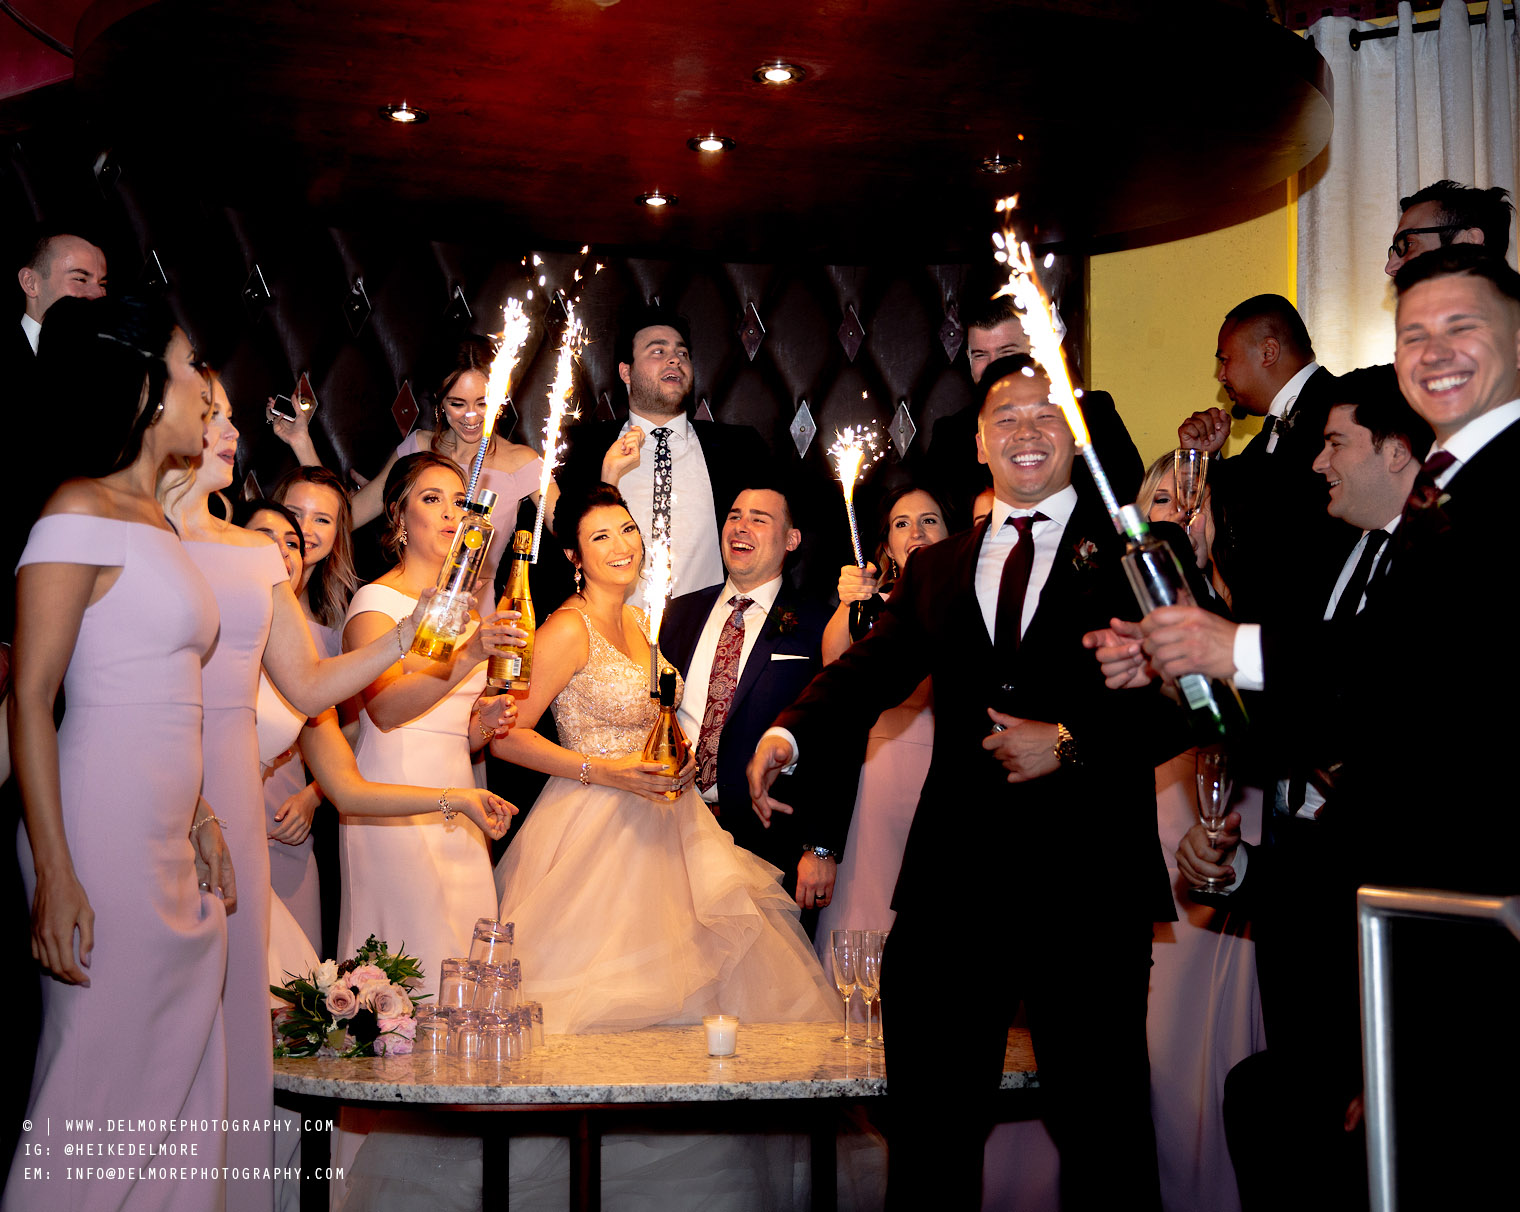 Windsor Wedding Photography Editorial Style